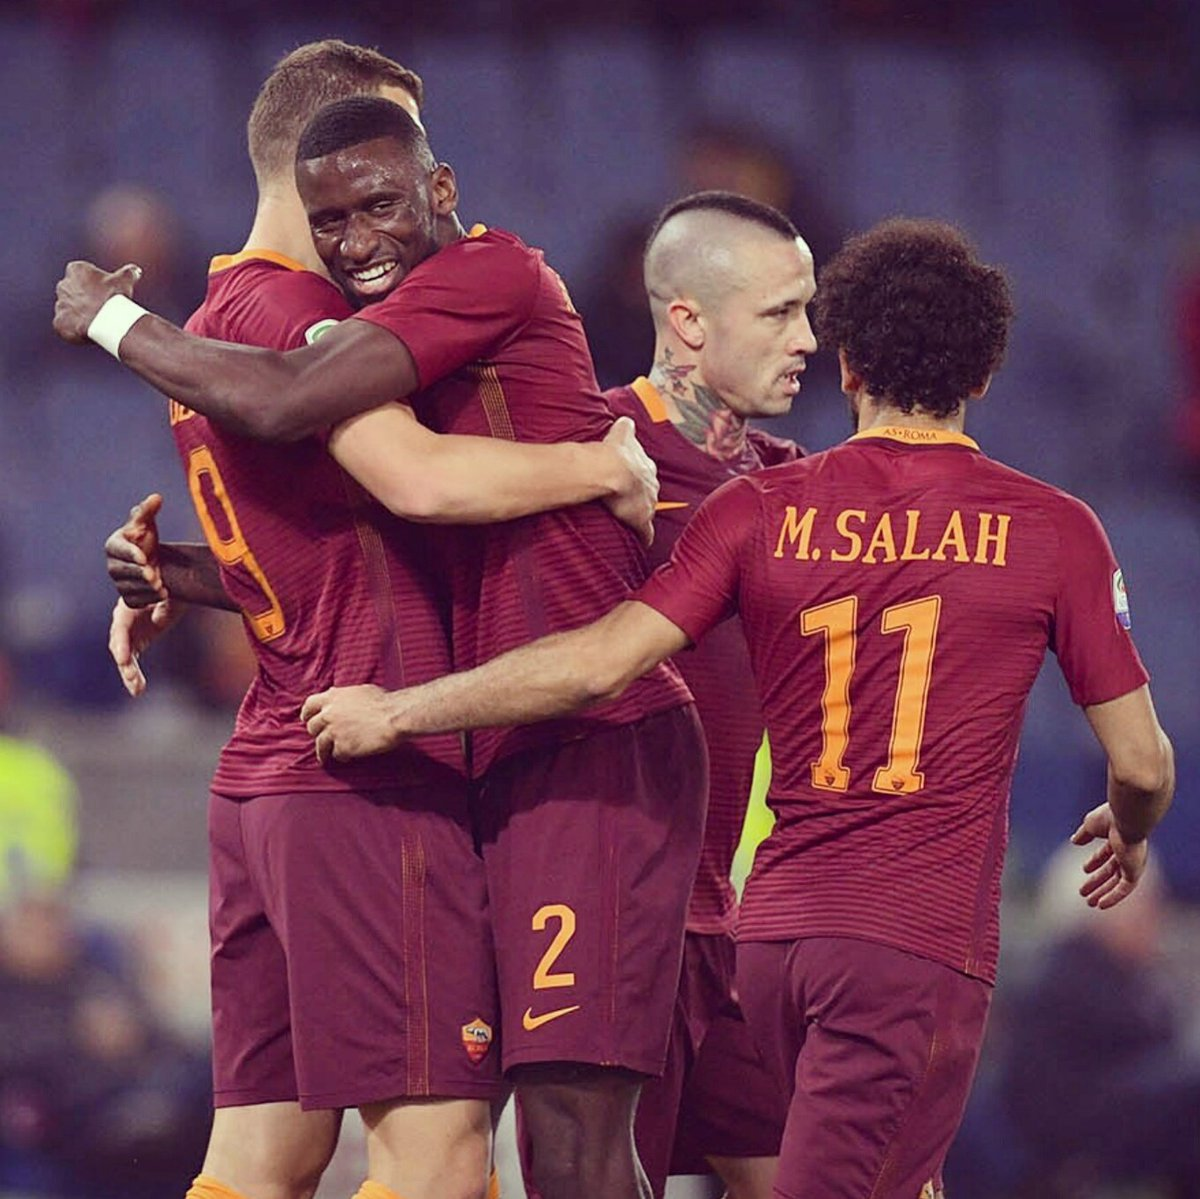 Exactly what we needed: 3 points 🙏🏽 #Hustle #DajeRoma #RomaSassuolo